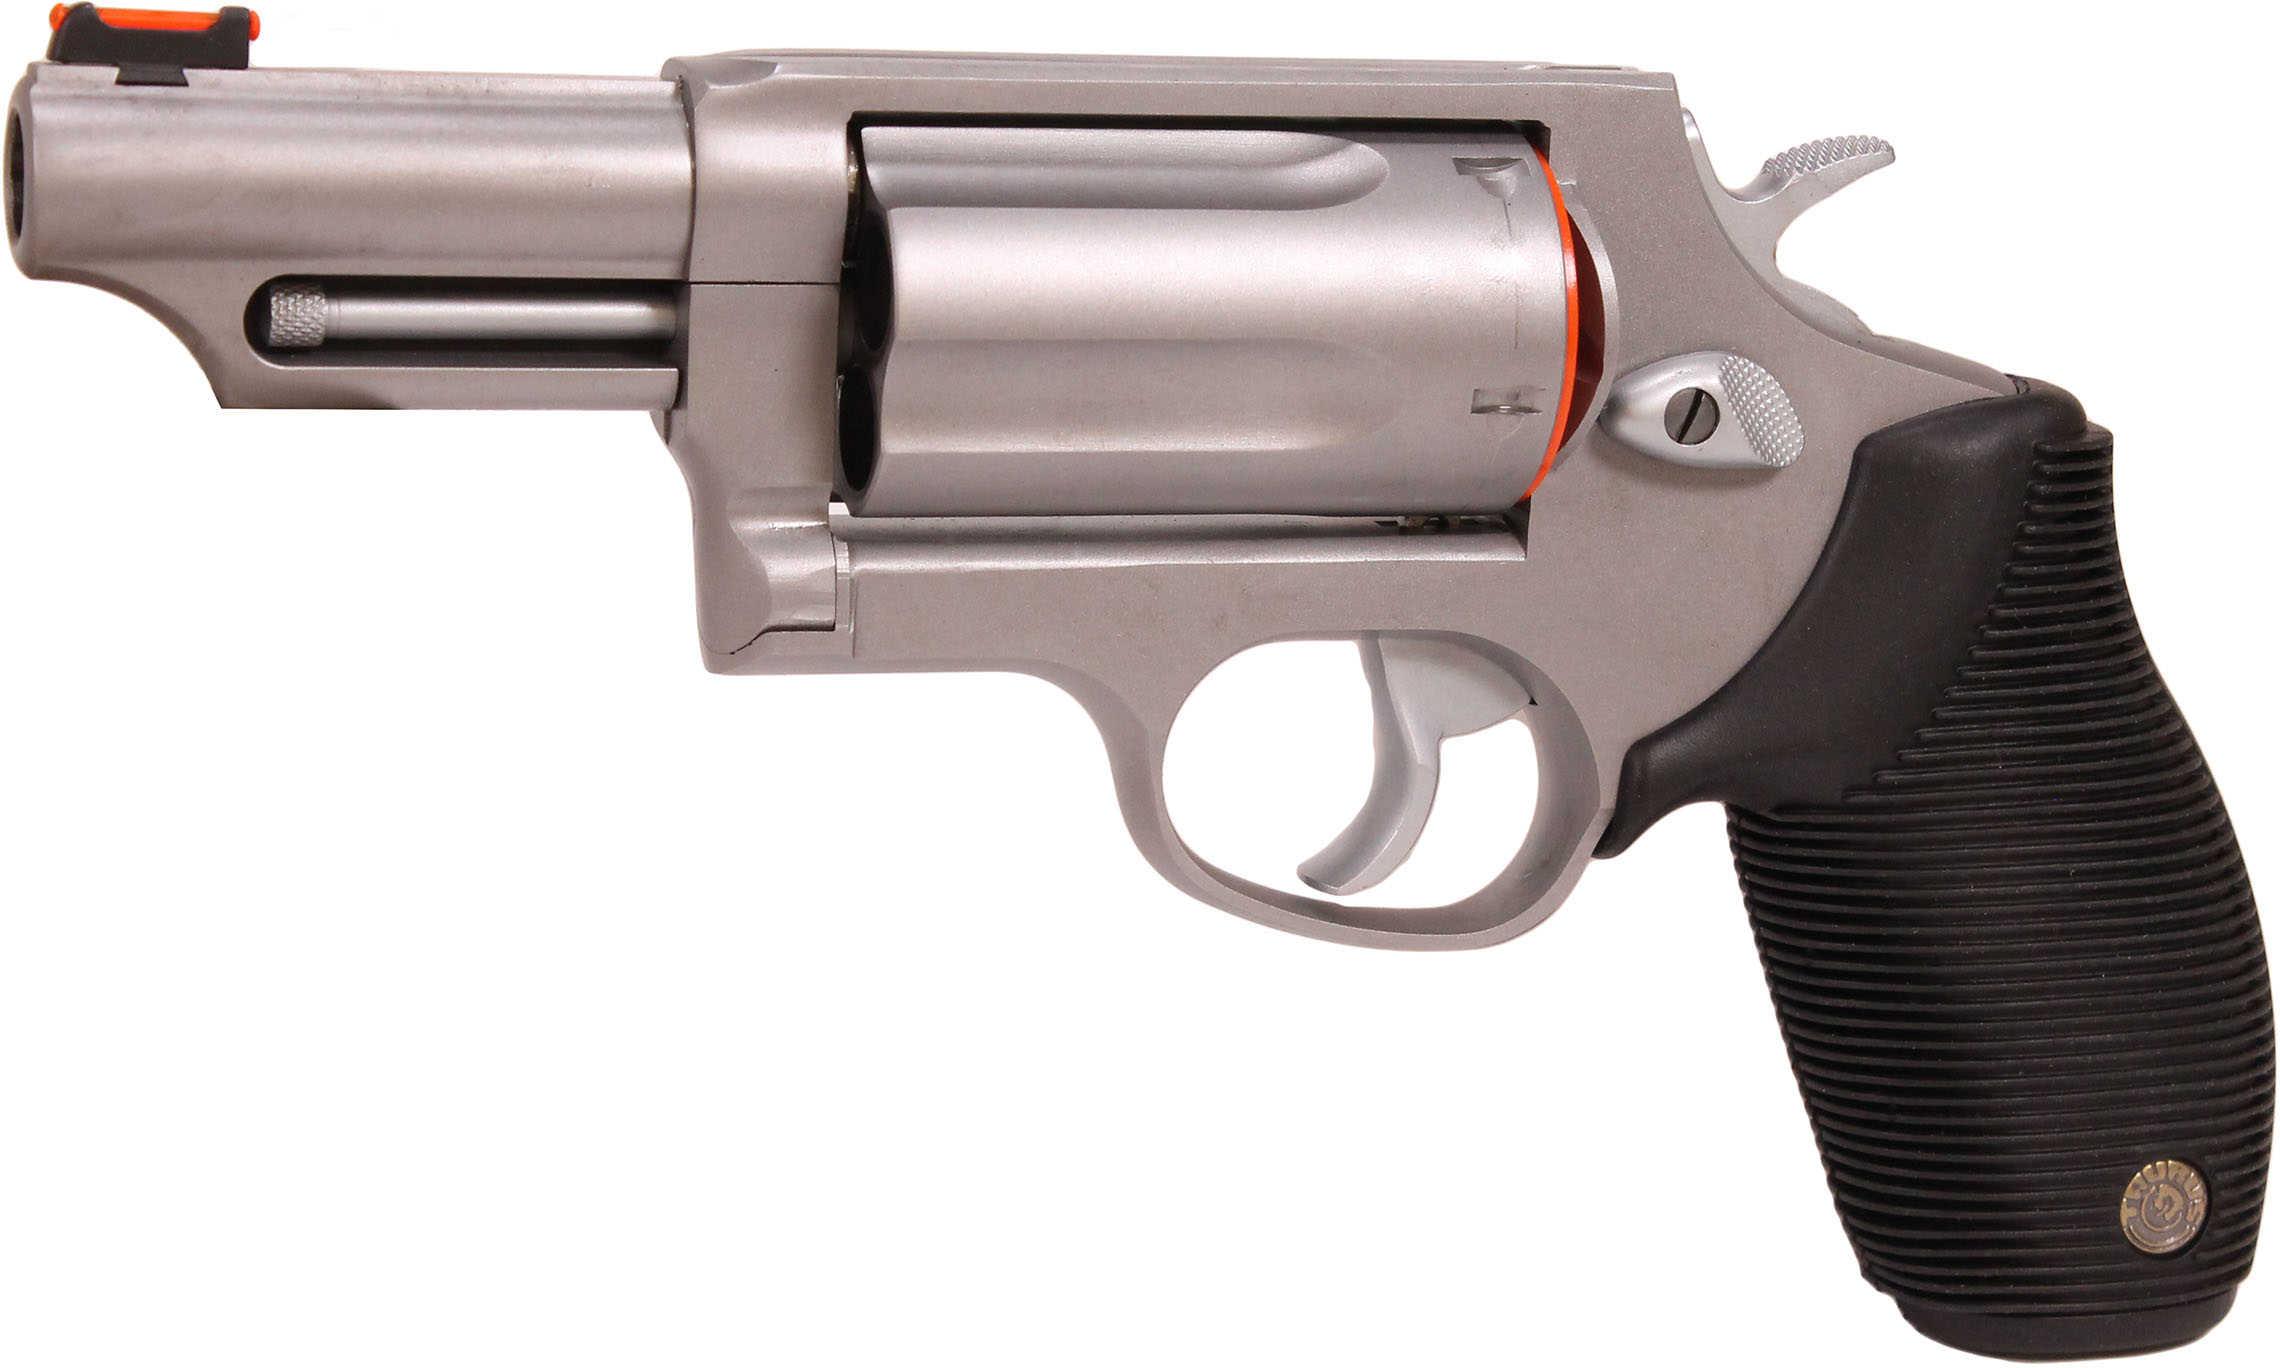 "Taurus Model ""The Judge"" 410 Gauge / 45 Long Colt Tracker Matte Stainless Steel 3"" Barrel Revolver 2441039T"